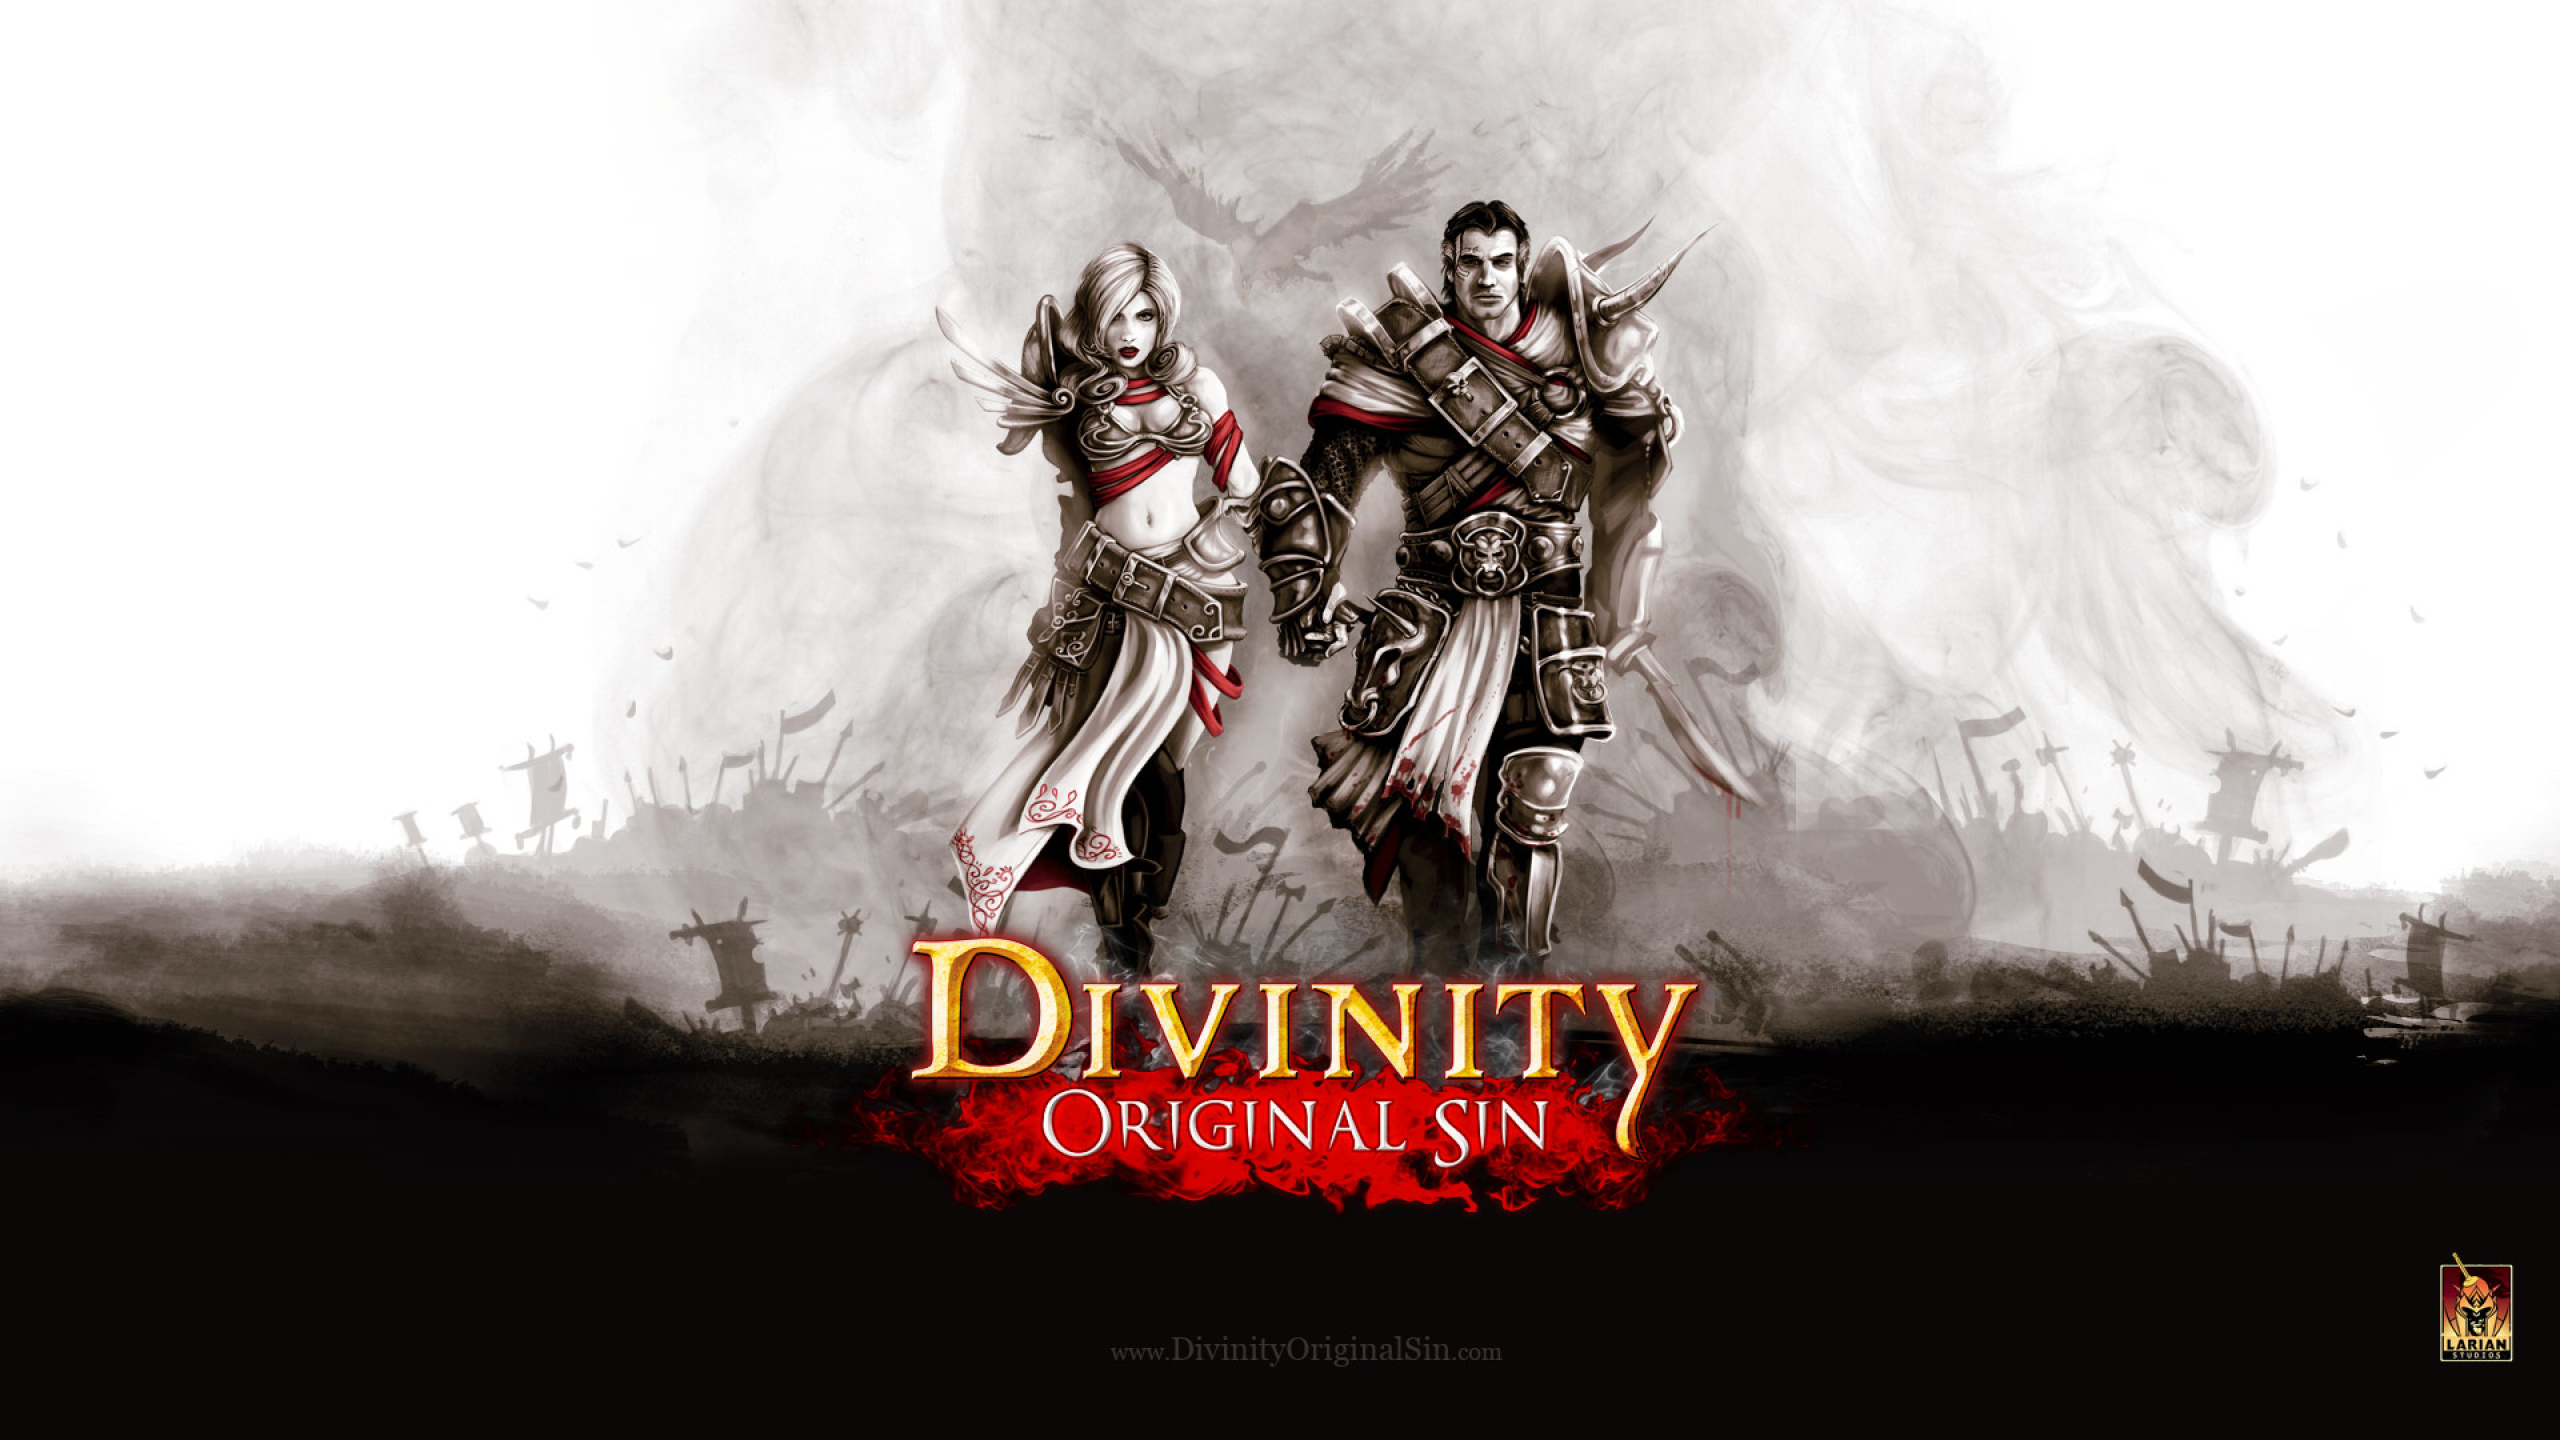 2560x1440 divinity original sin, rpg, fantasy 1440P